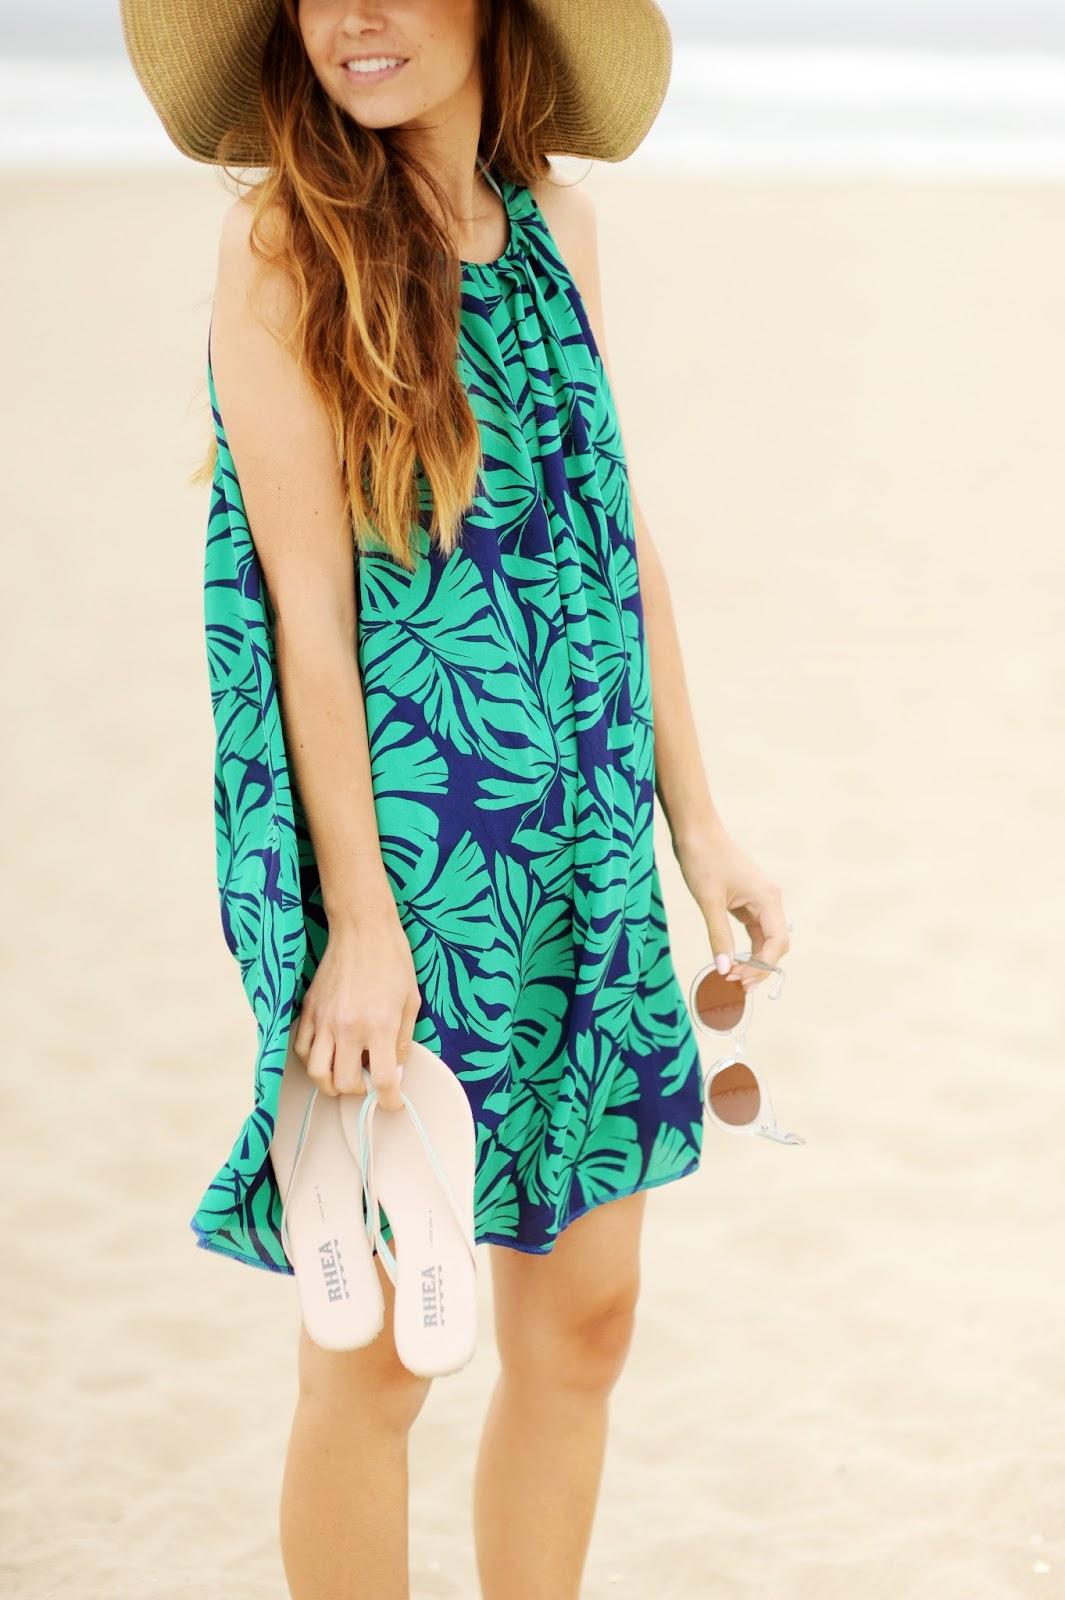 a0bede2d2511 Details: beach dress, made by me | similar beach hat | asos glasses (under  $30!) | target blanket | old navy beach bag (old) | rhea sandals, c/o